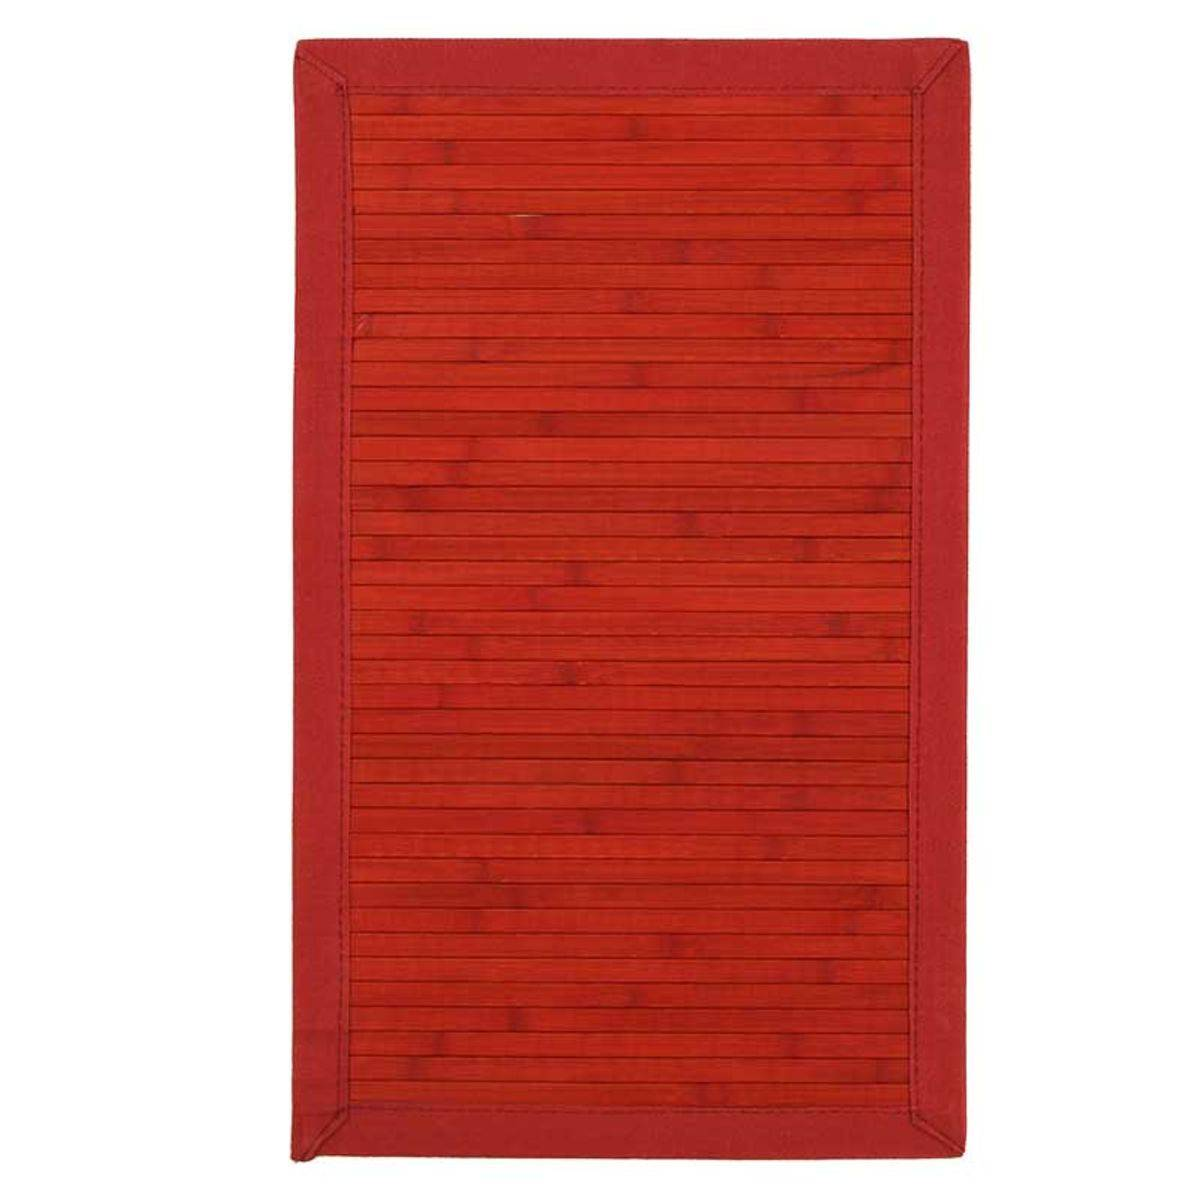 TheDecoFactory SOLO BAMBOO - Tapis en bambou larges lattes et ganse rouge 45x75 Rouge